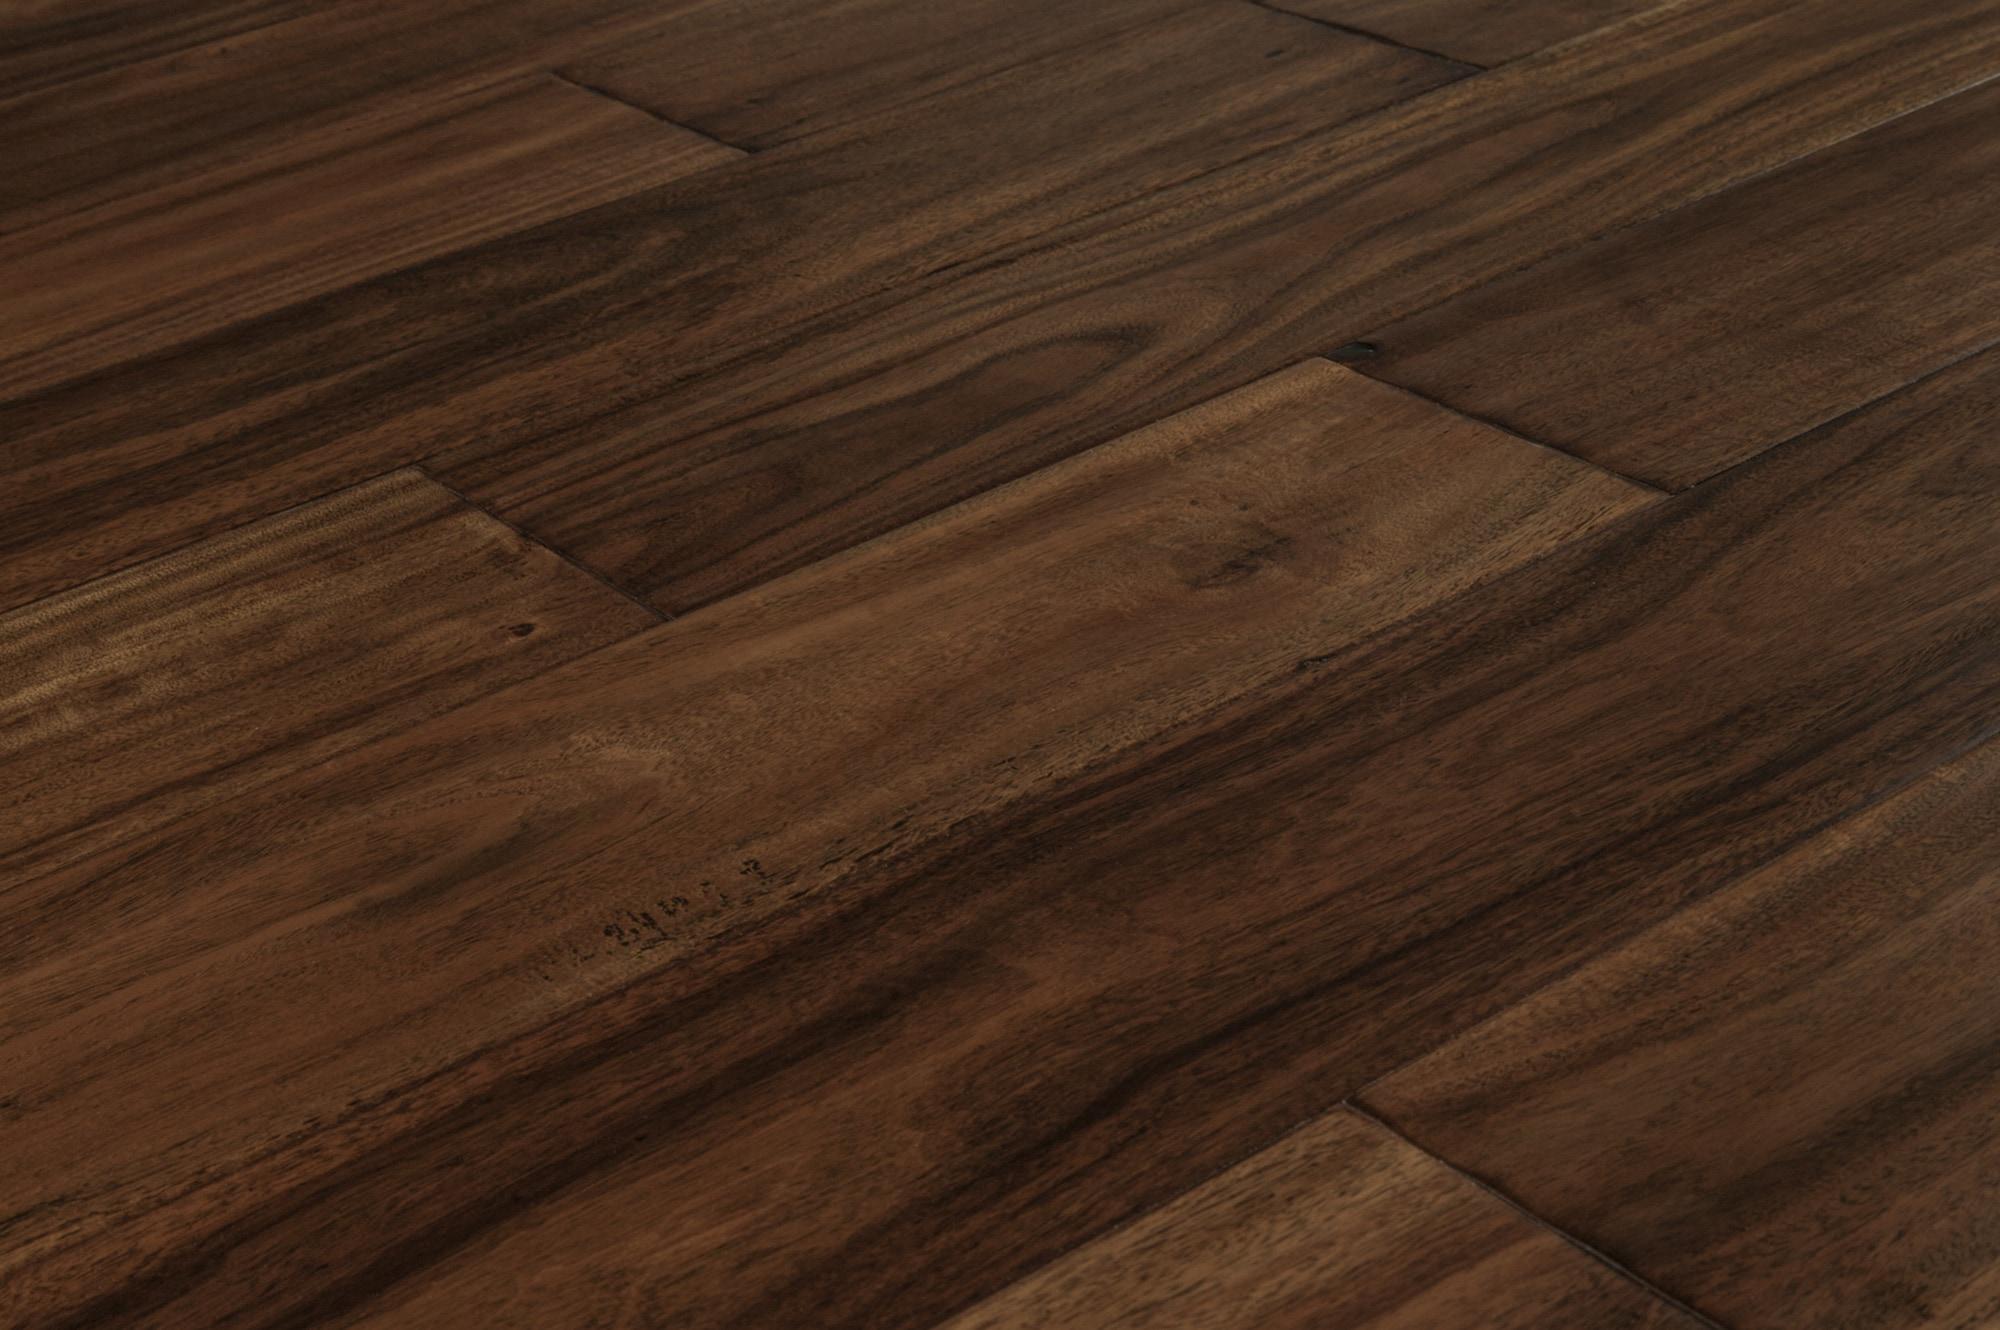 Jasper Engineered Hardwood Nakai Acacia Collection Teak